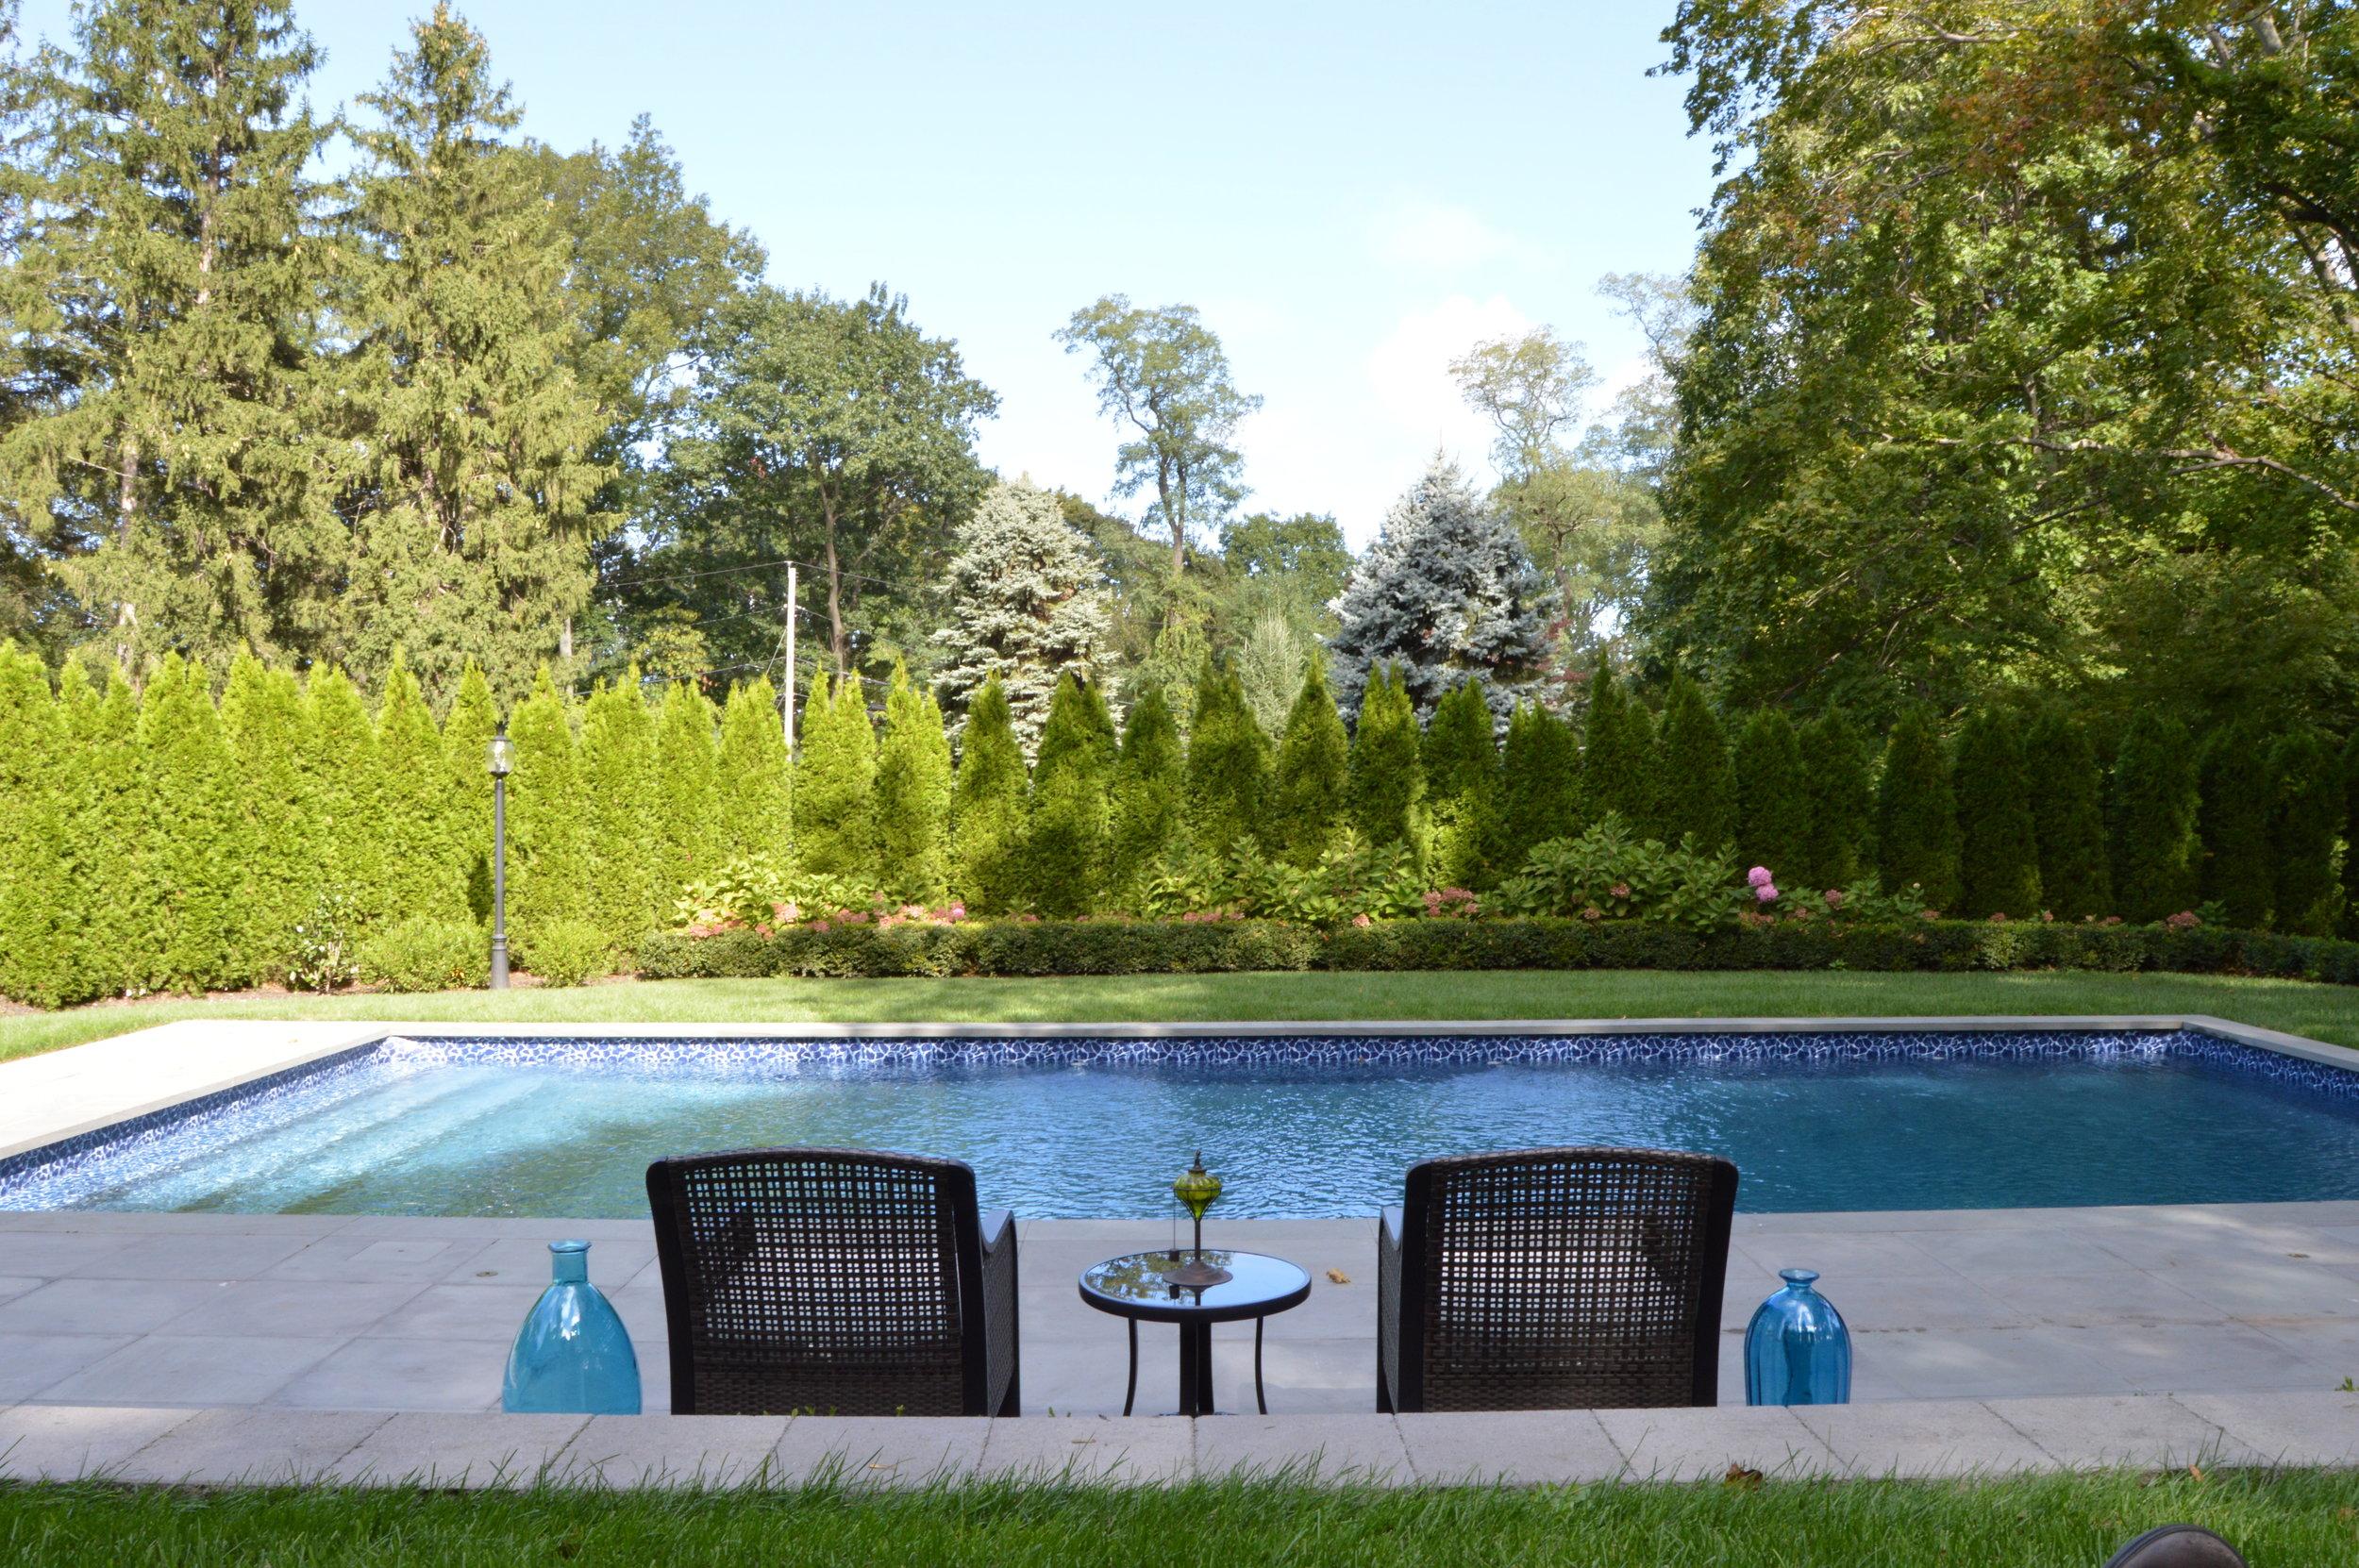 Northport, NY swimming pool patio